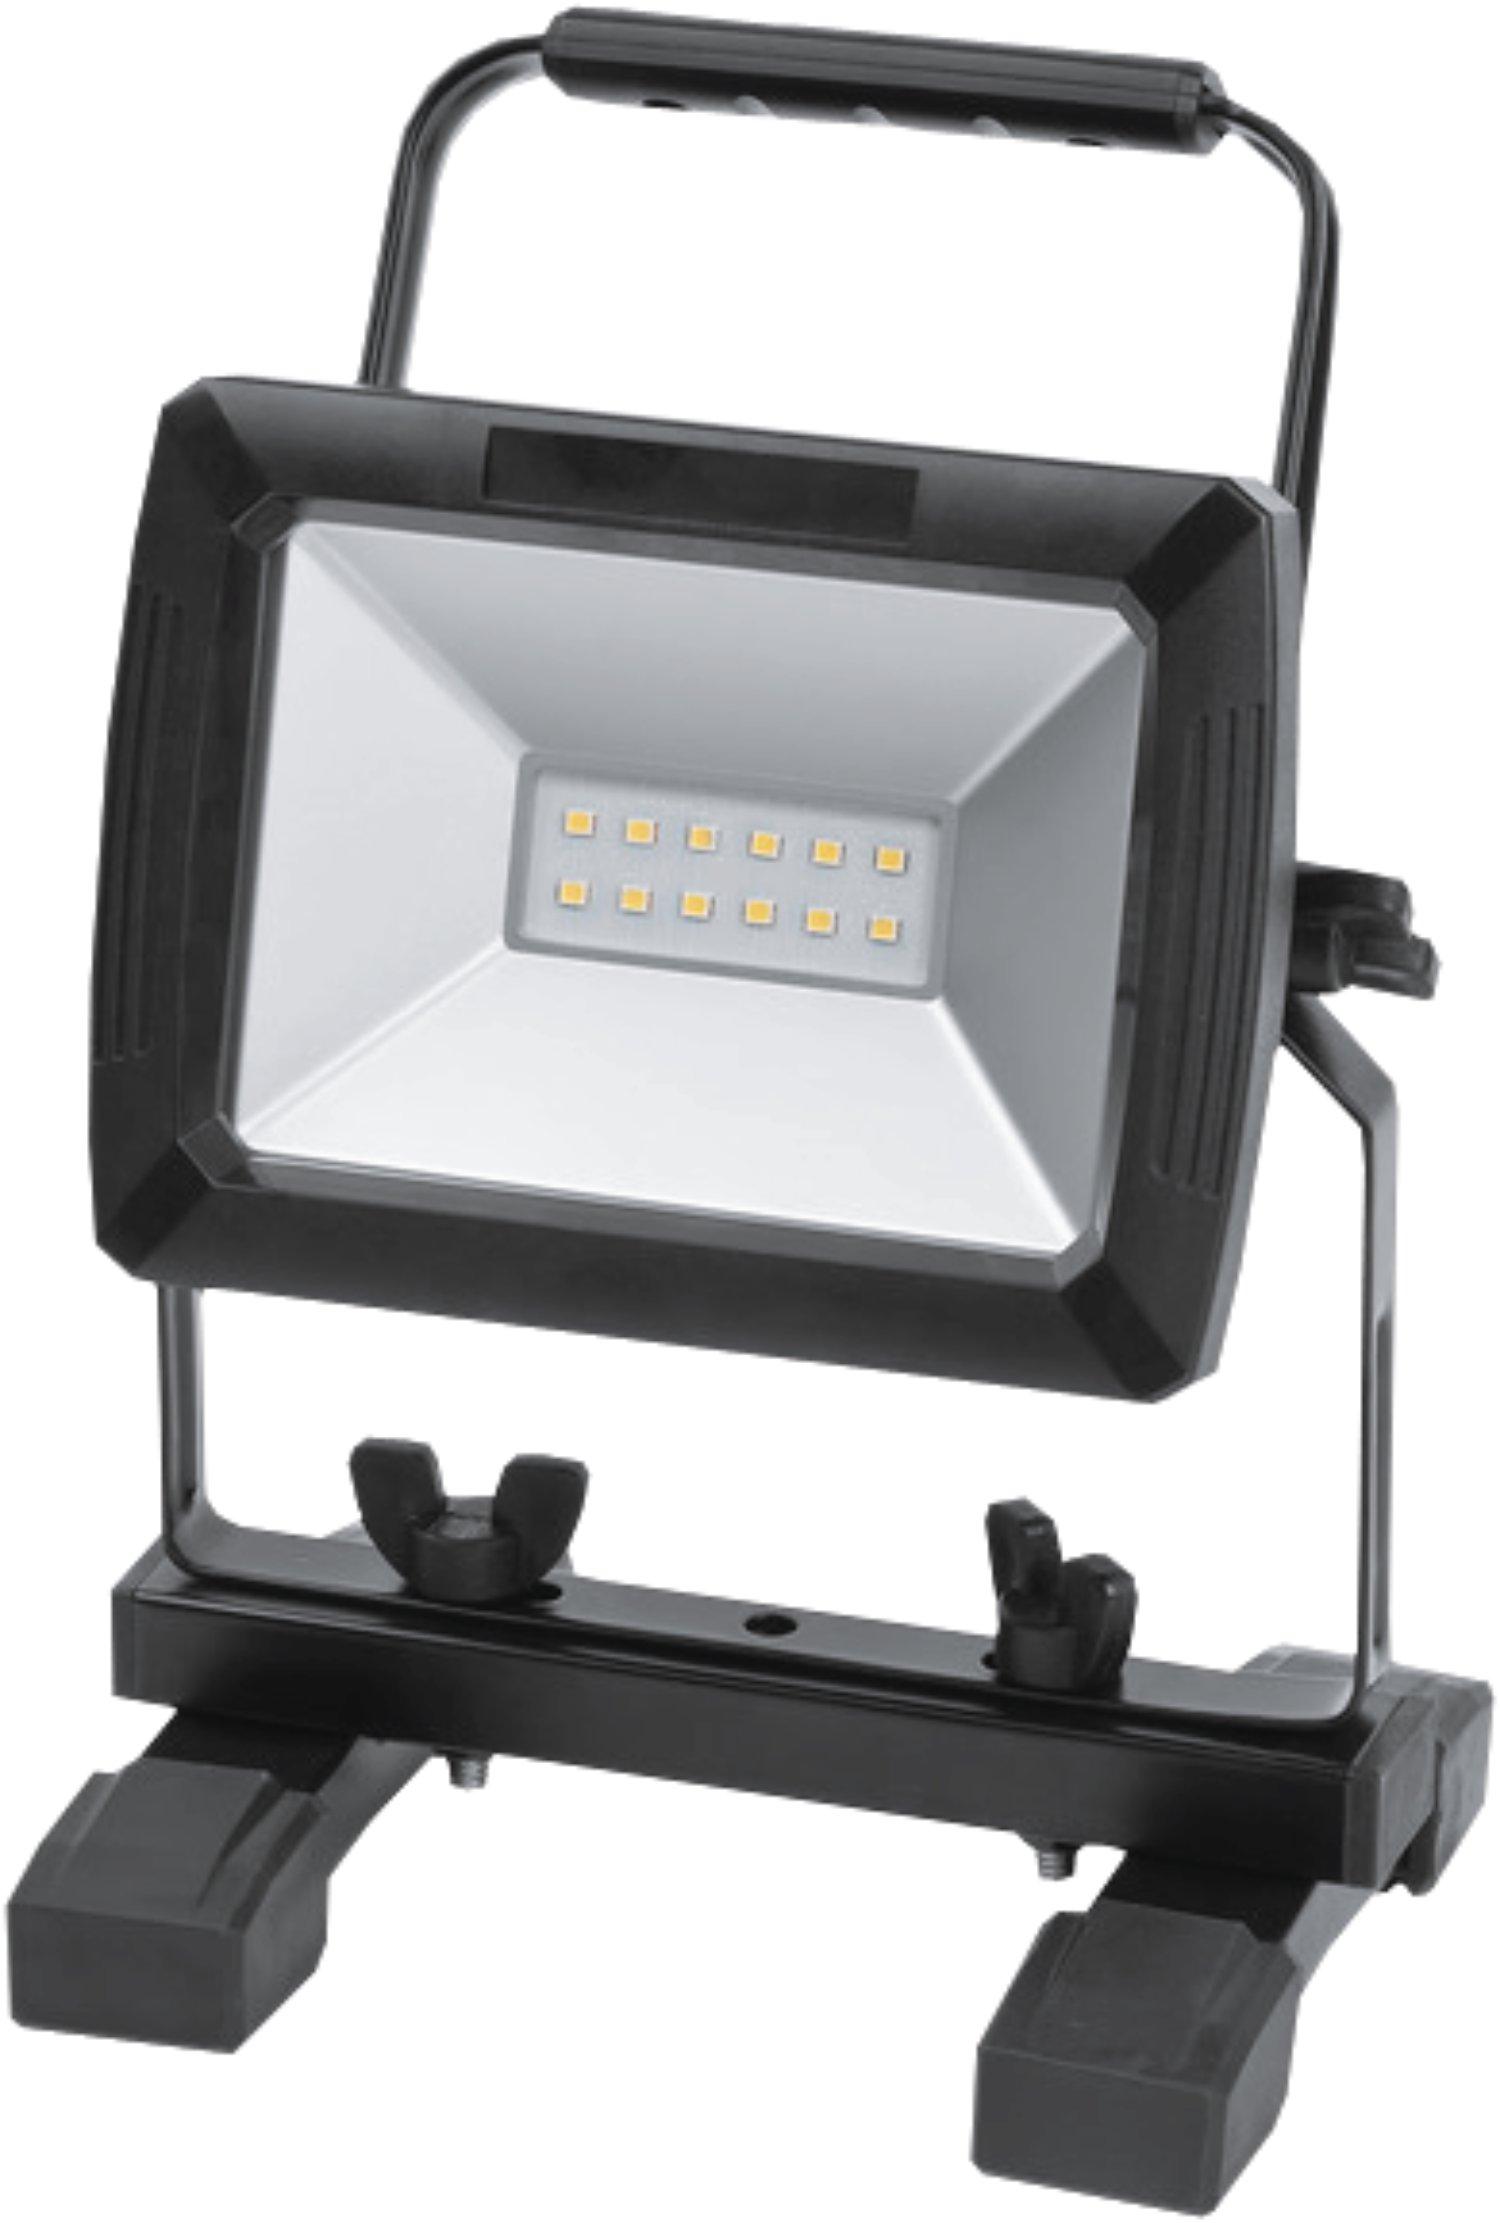 BRENNENSTUHL MOBILE AKKU SMD LED Leuchte ML DA 1206 IP54 10W